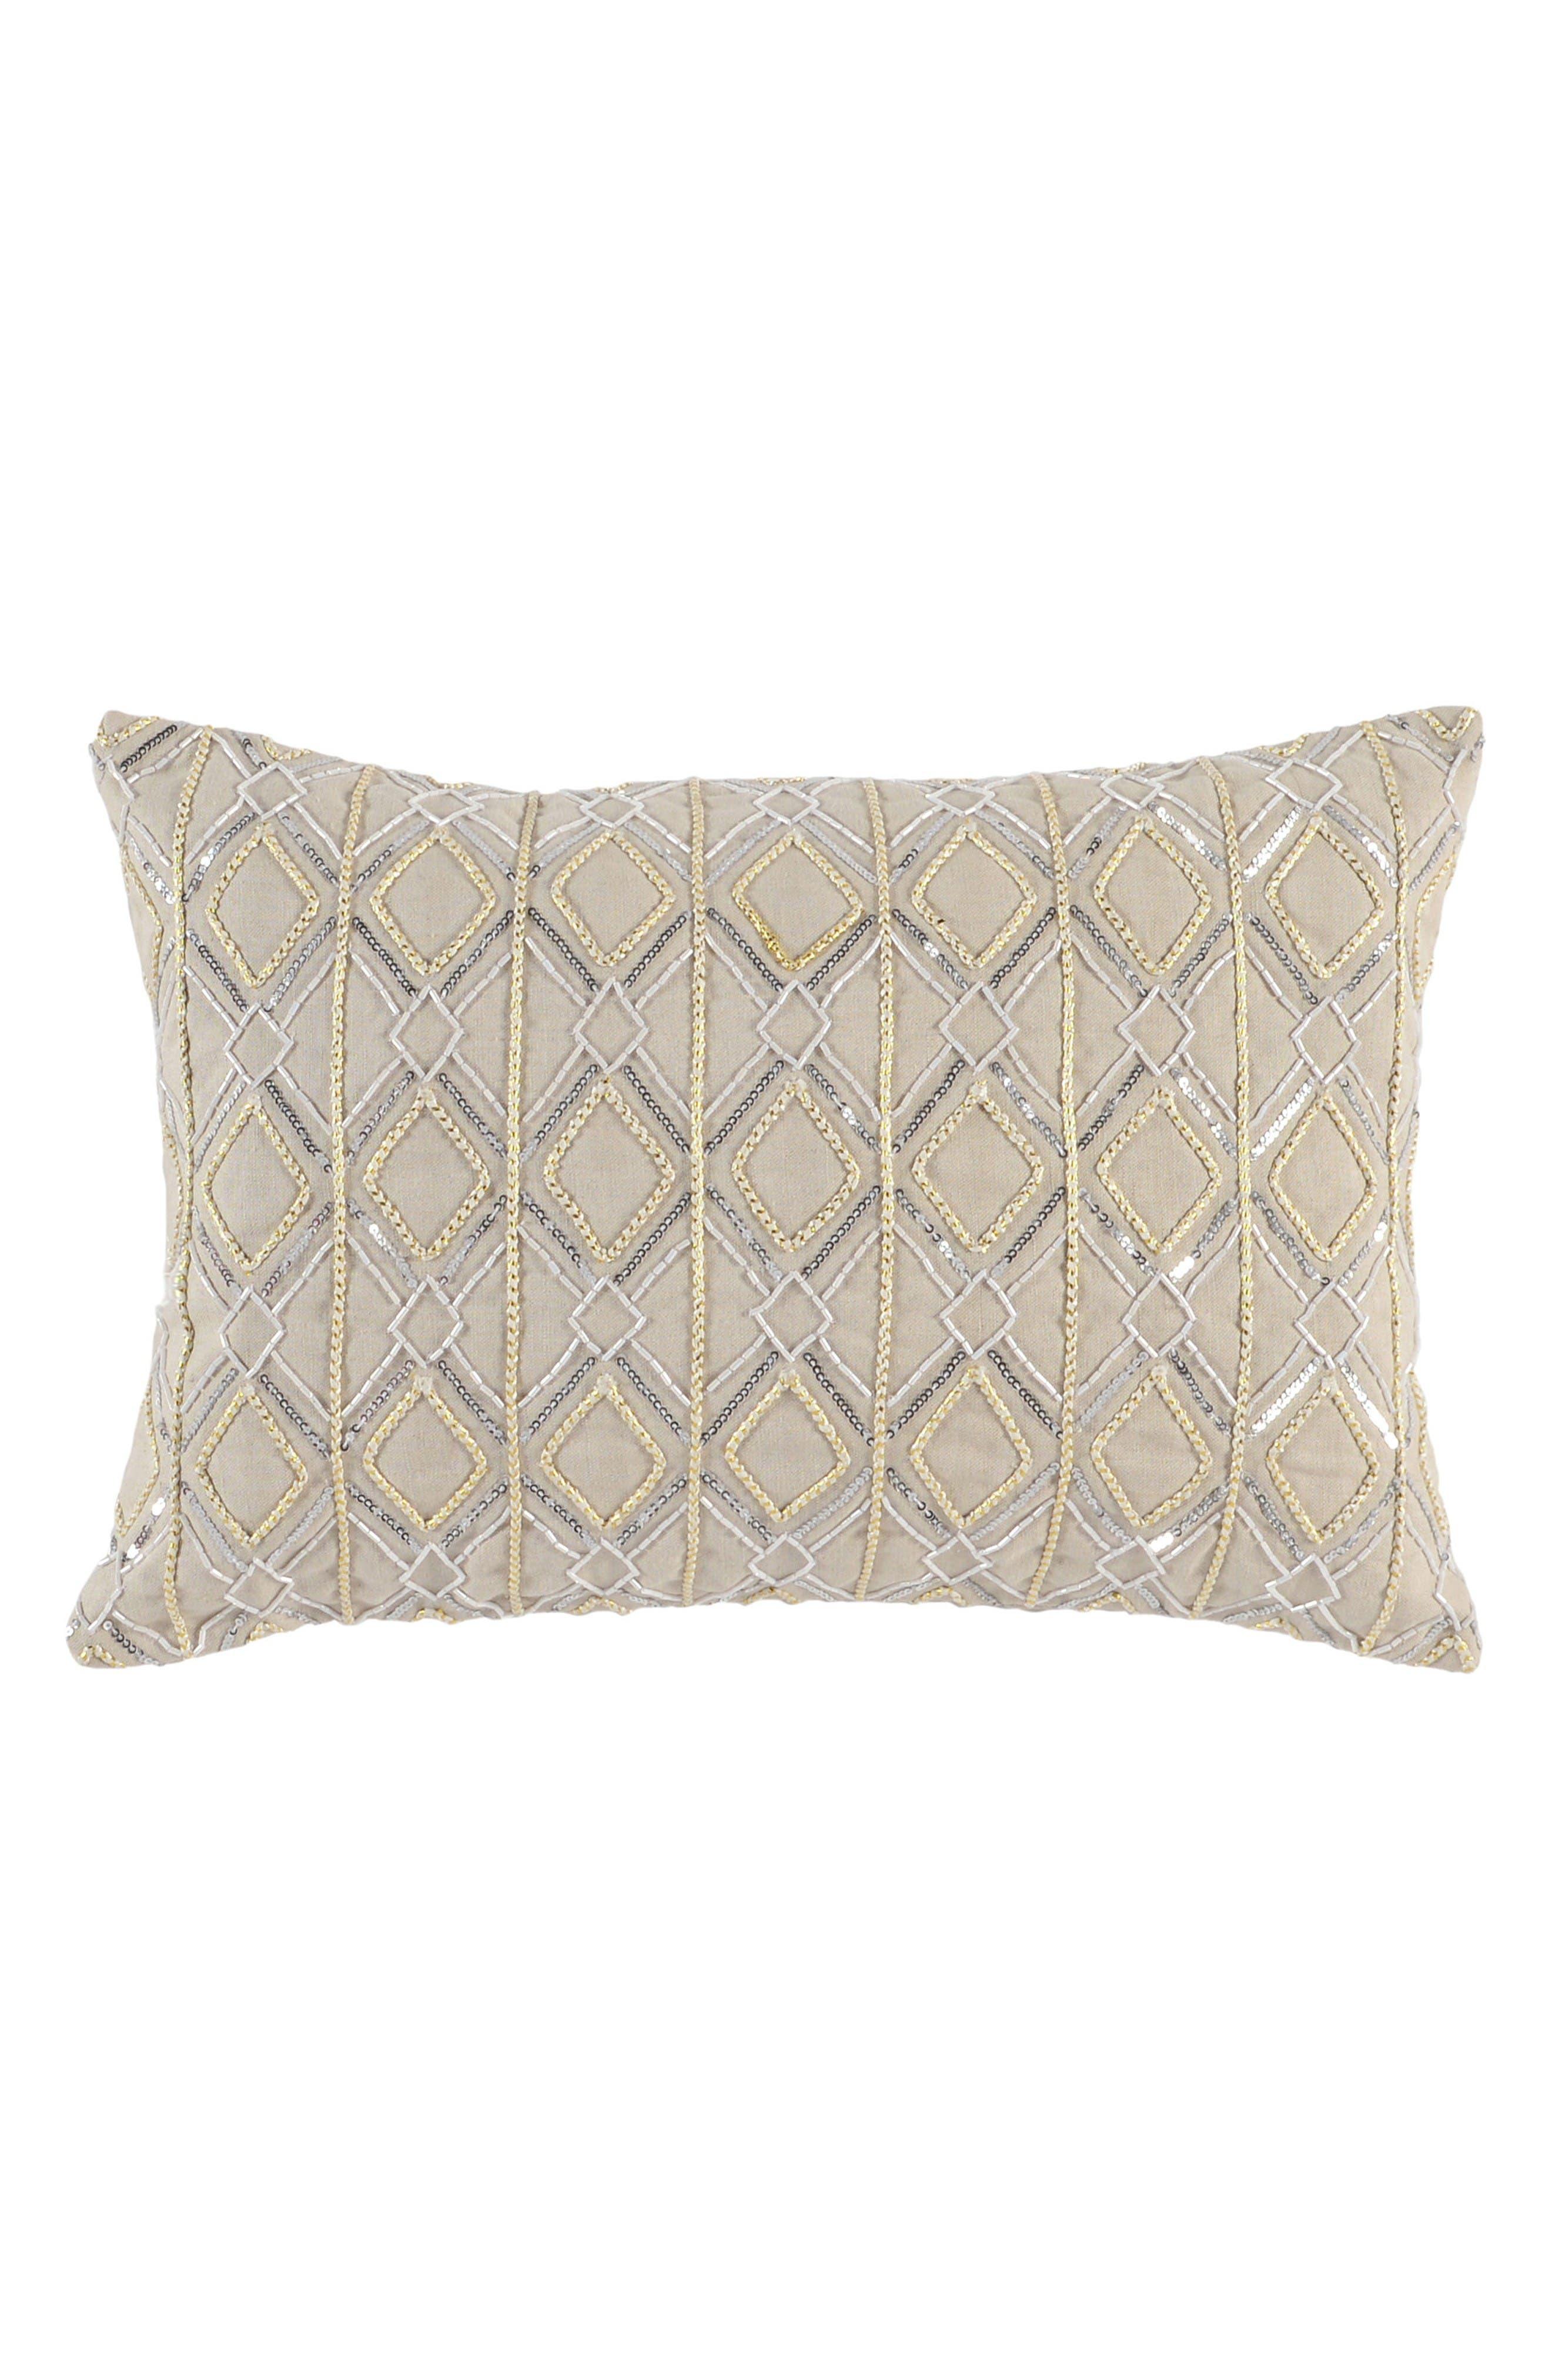 Main Image - Villa Home Collection Aledo Accent Pillow